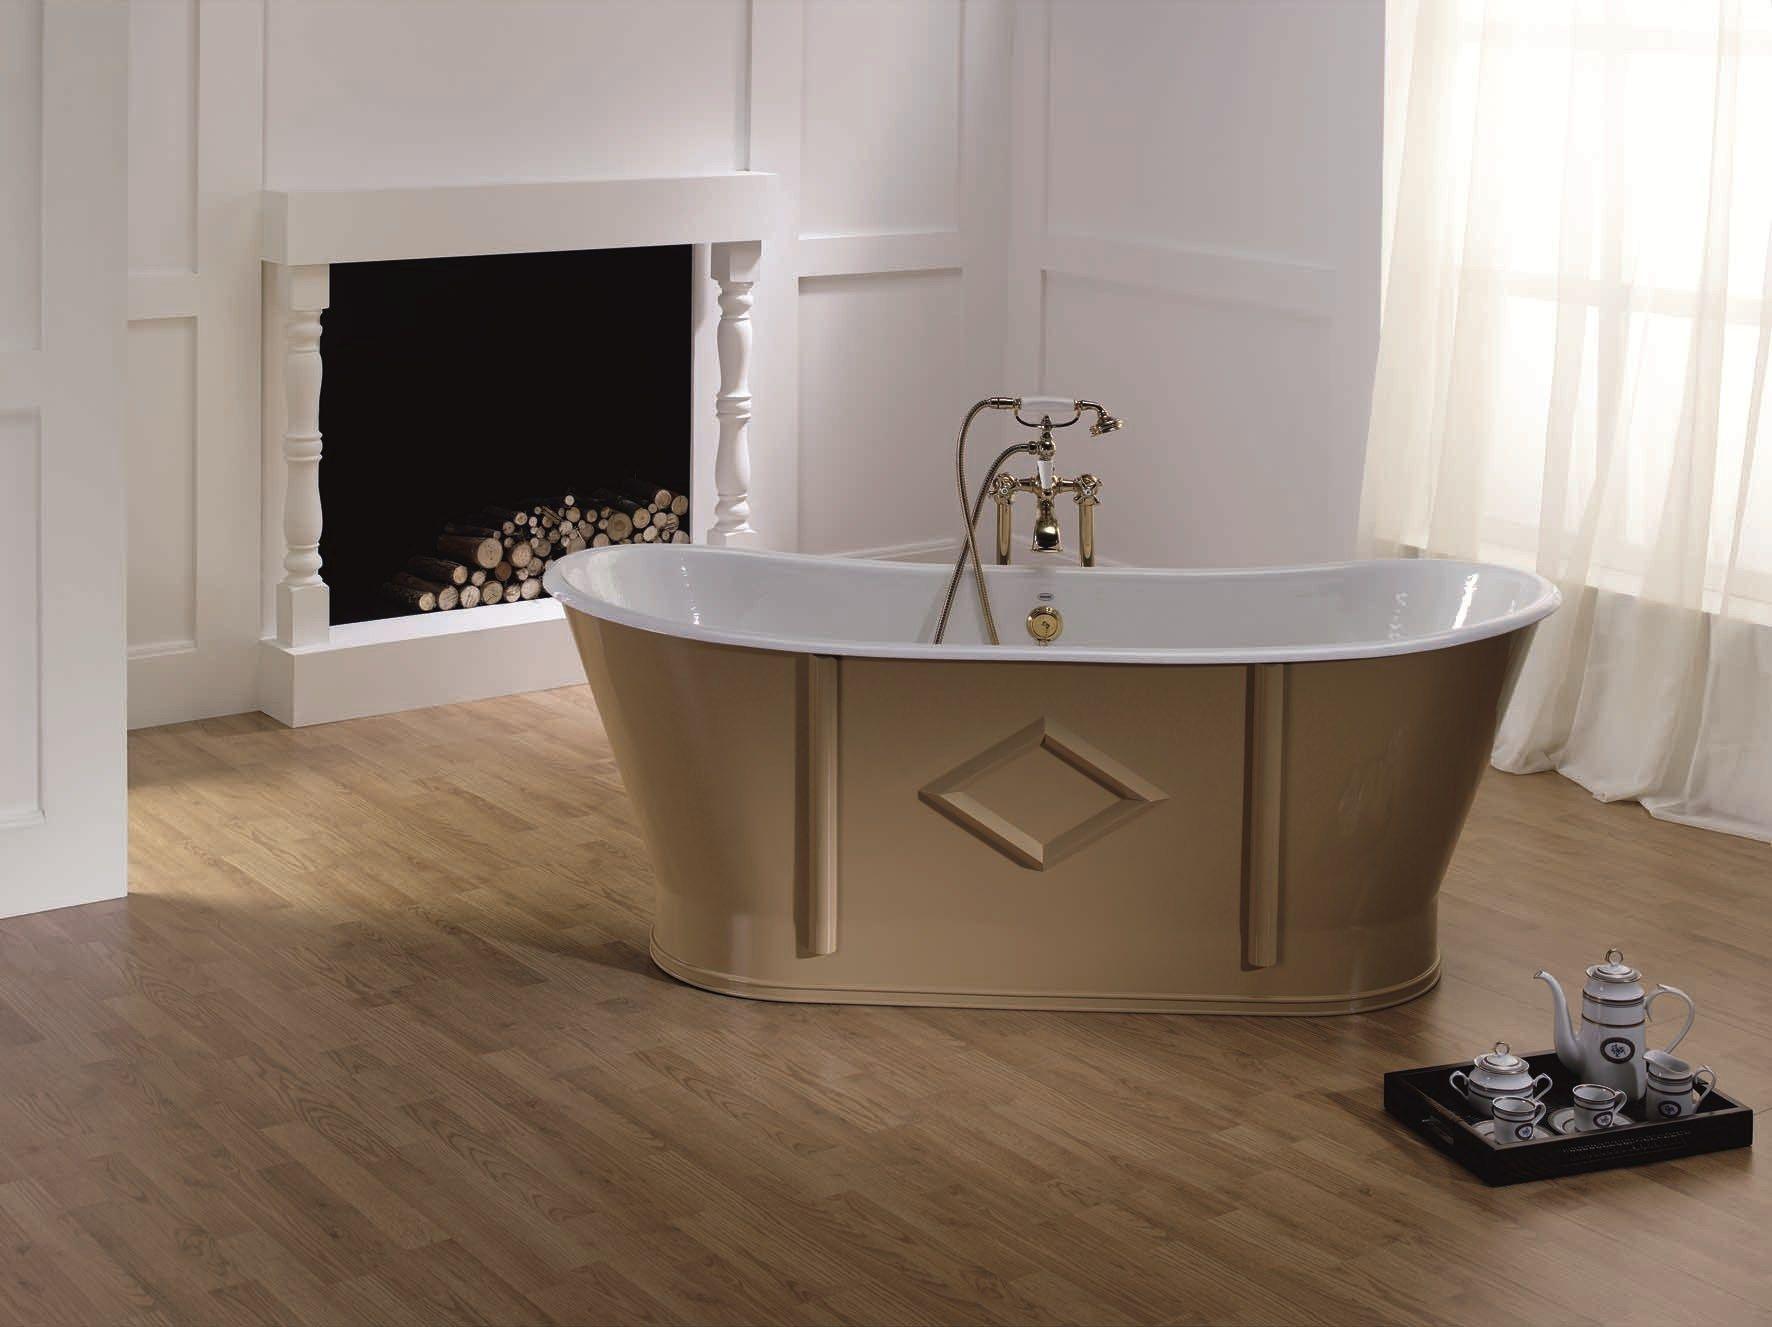 Vasca Da Bagno Vintage : Vasche da bagno in ghisa vasche e docce archiproducts